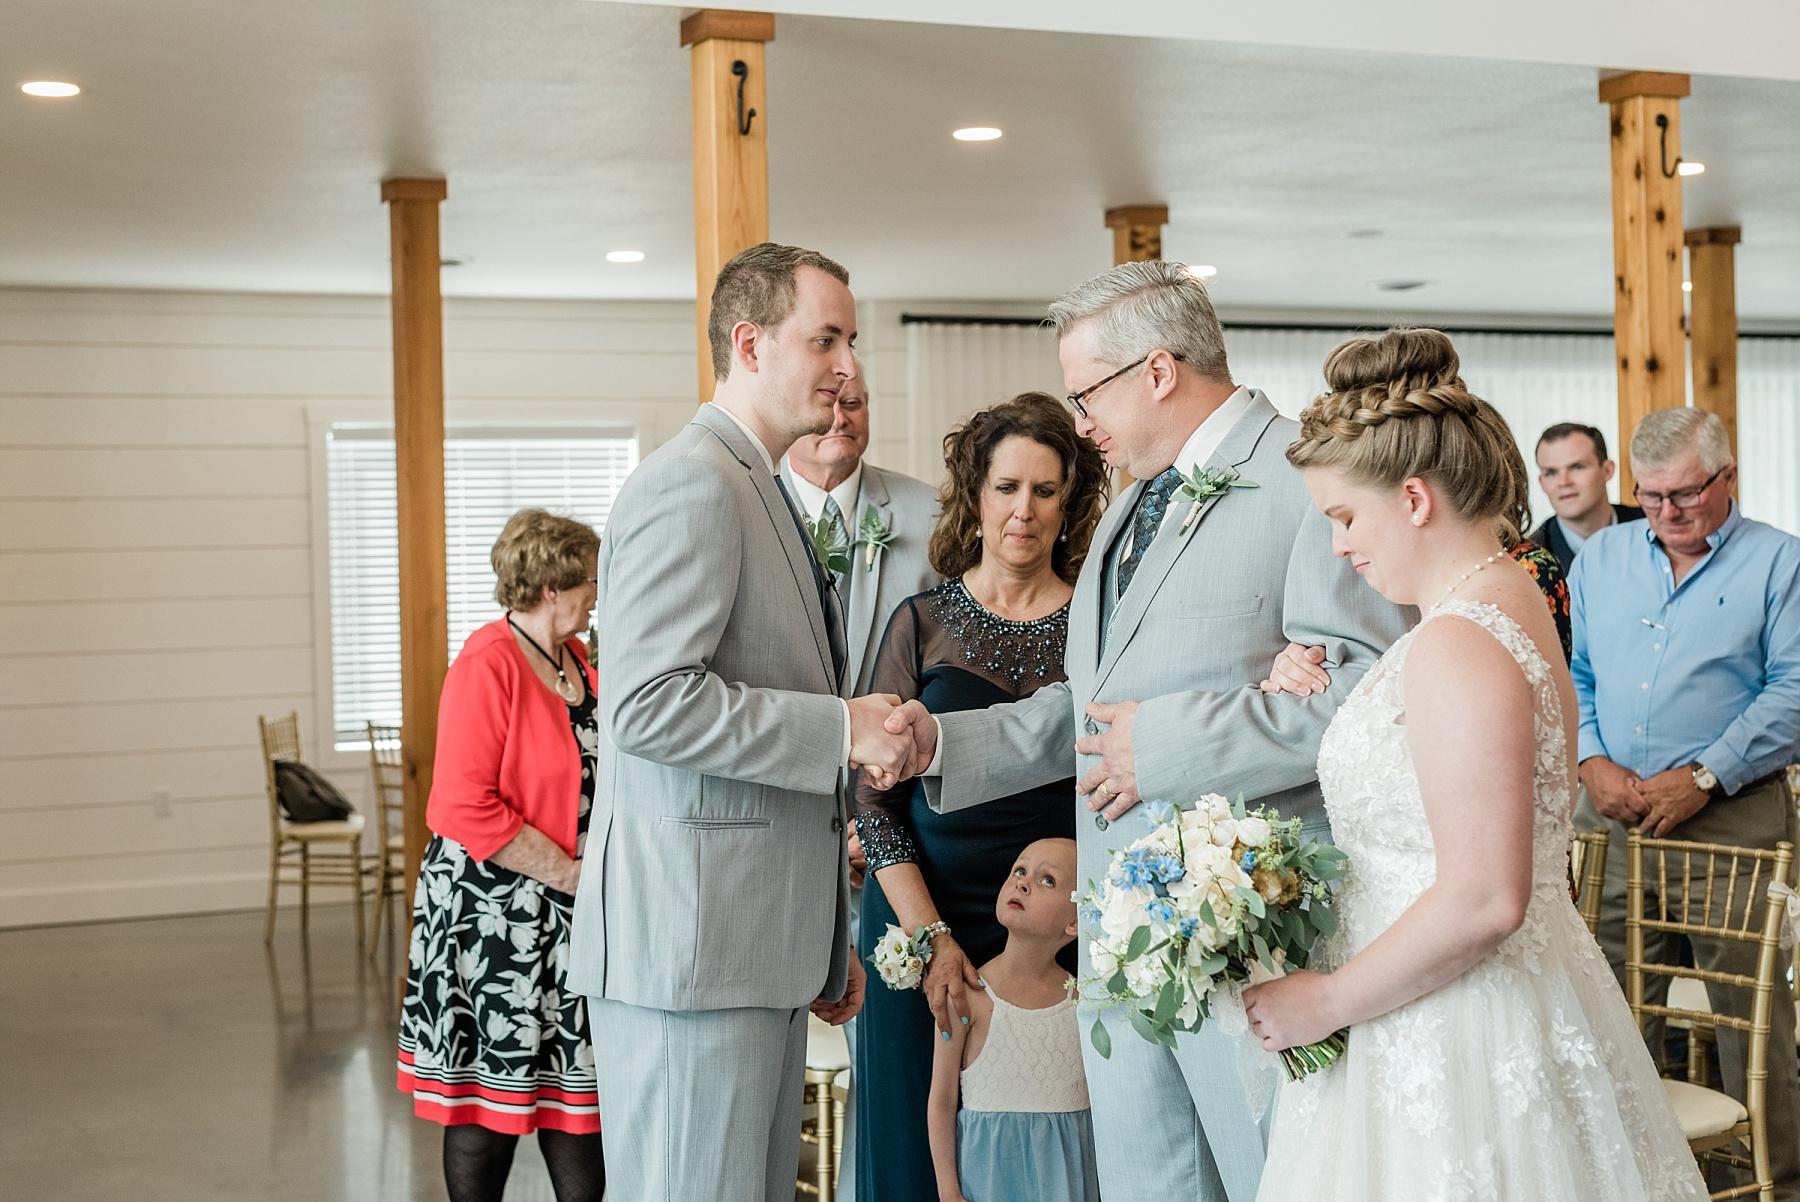 Intimate Summer Wedding at Emerson Fields by Kelsi Kliethermes Photography Best Missouri and Maui Wedding Photographer_0004.jpg